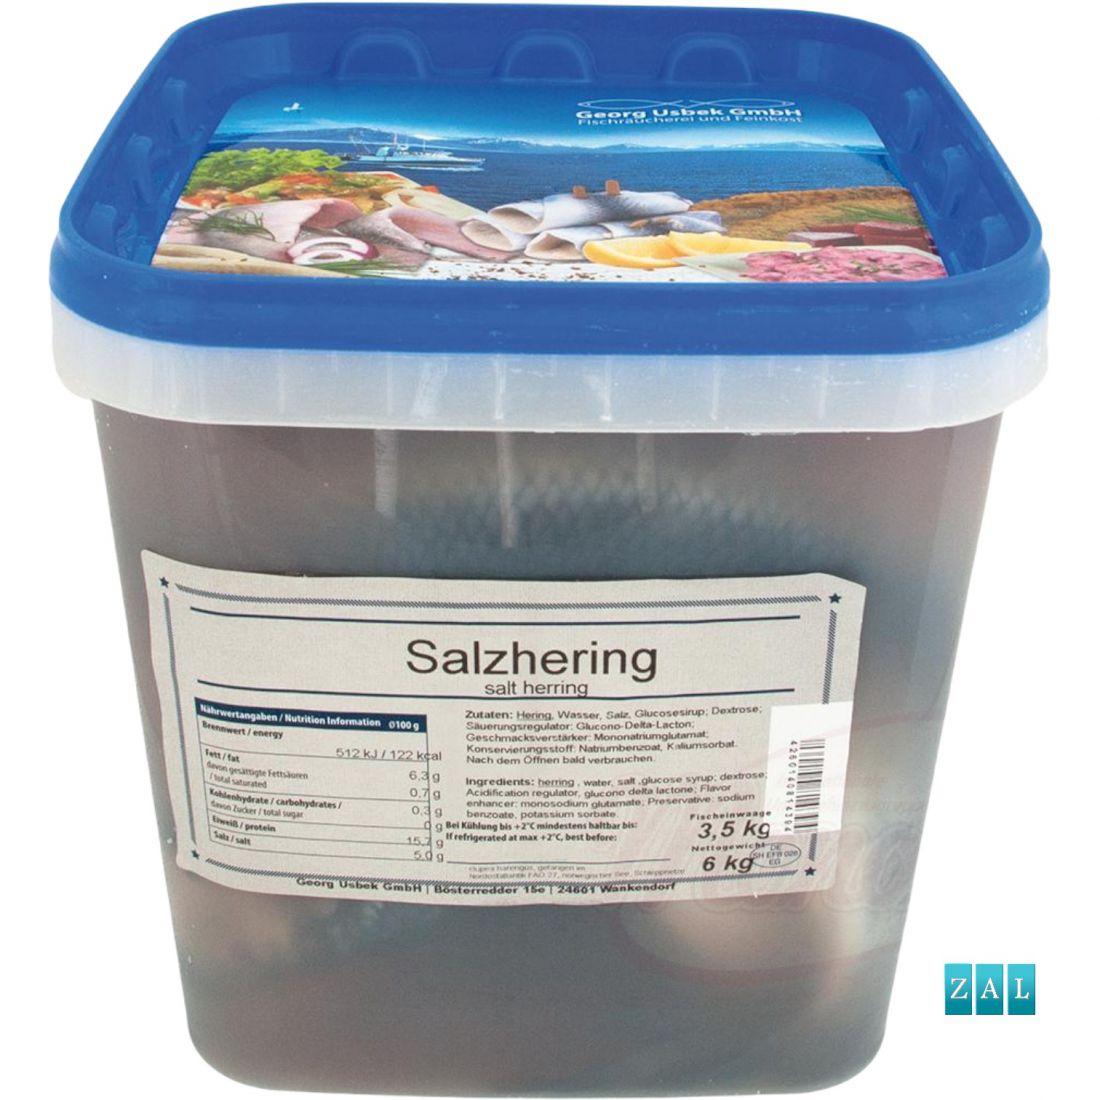 Hering (Glupea harengus) enyhén sós lében 3,5kg